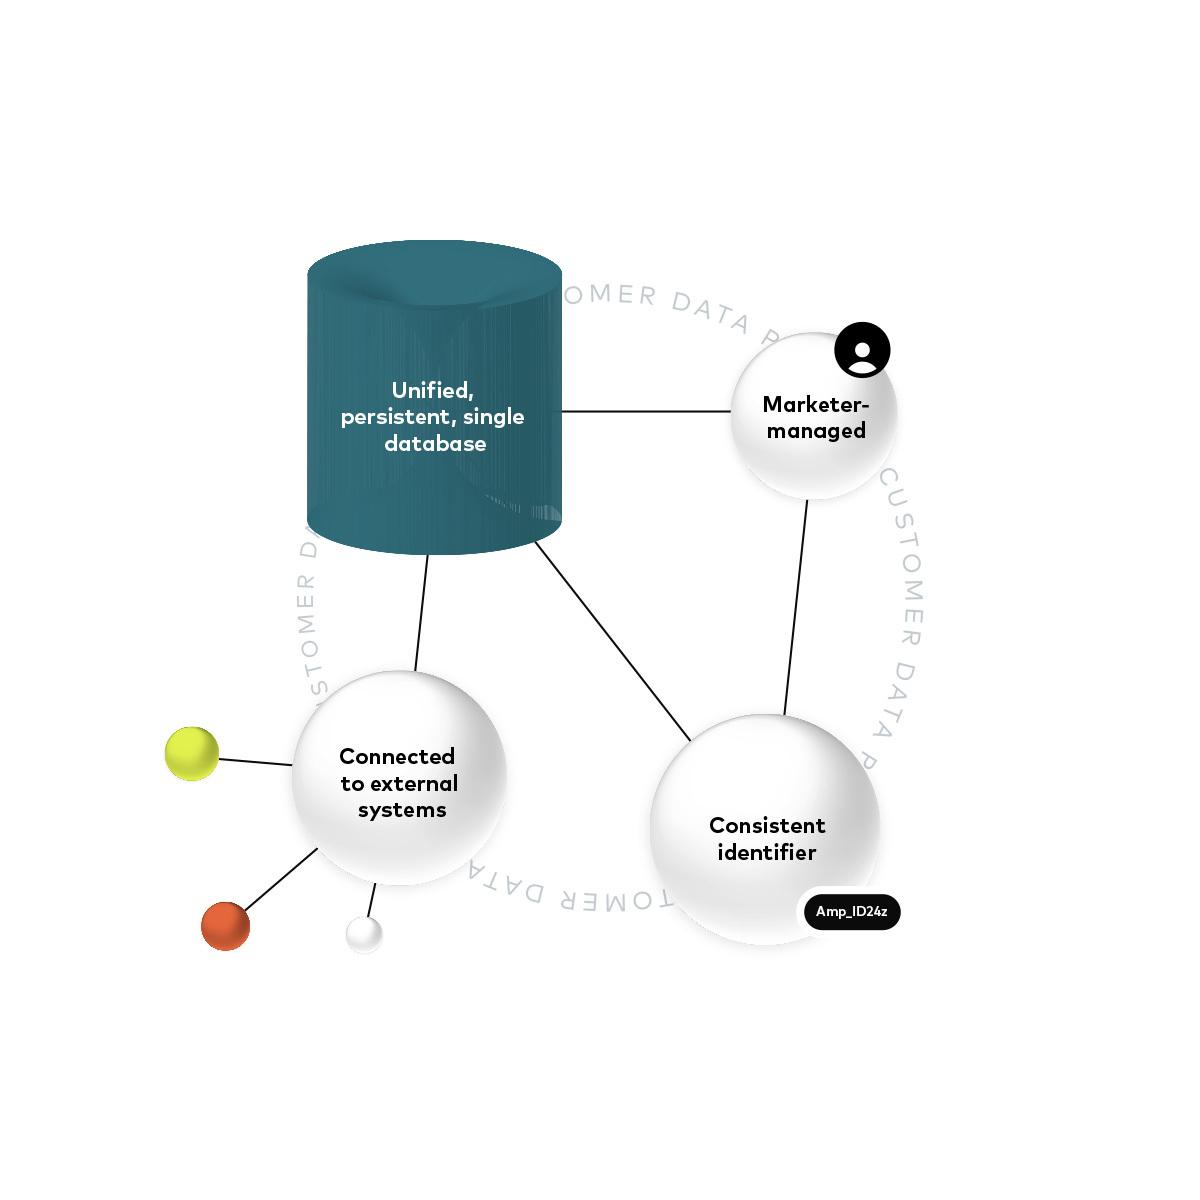 Image of CDP diagram white